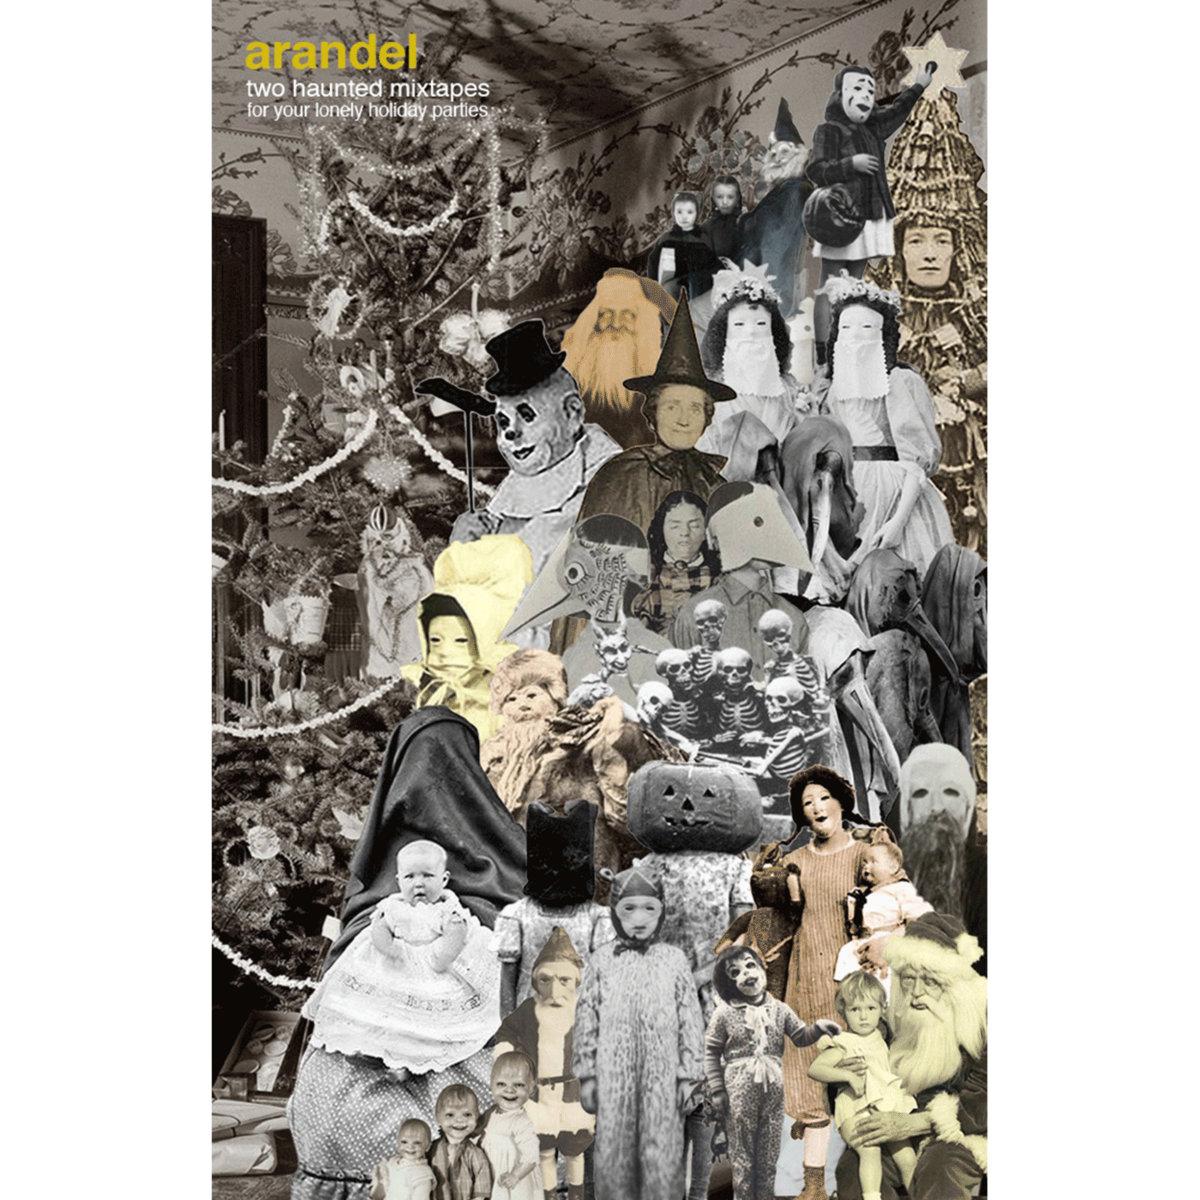 from beyond, the halloween mixtape | arandel